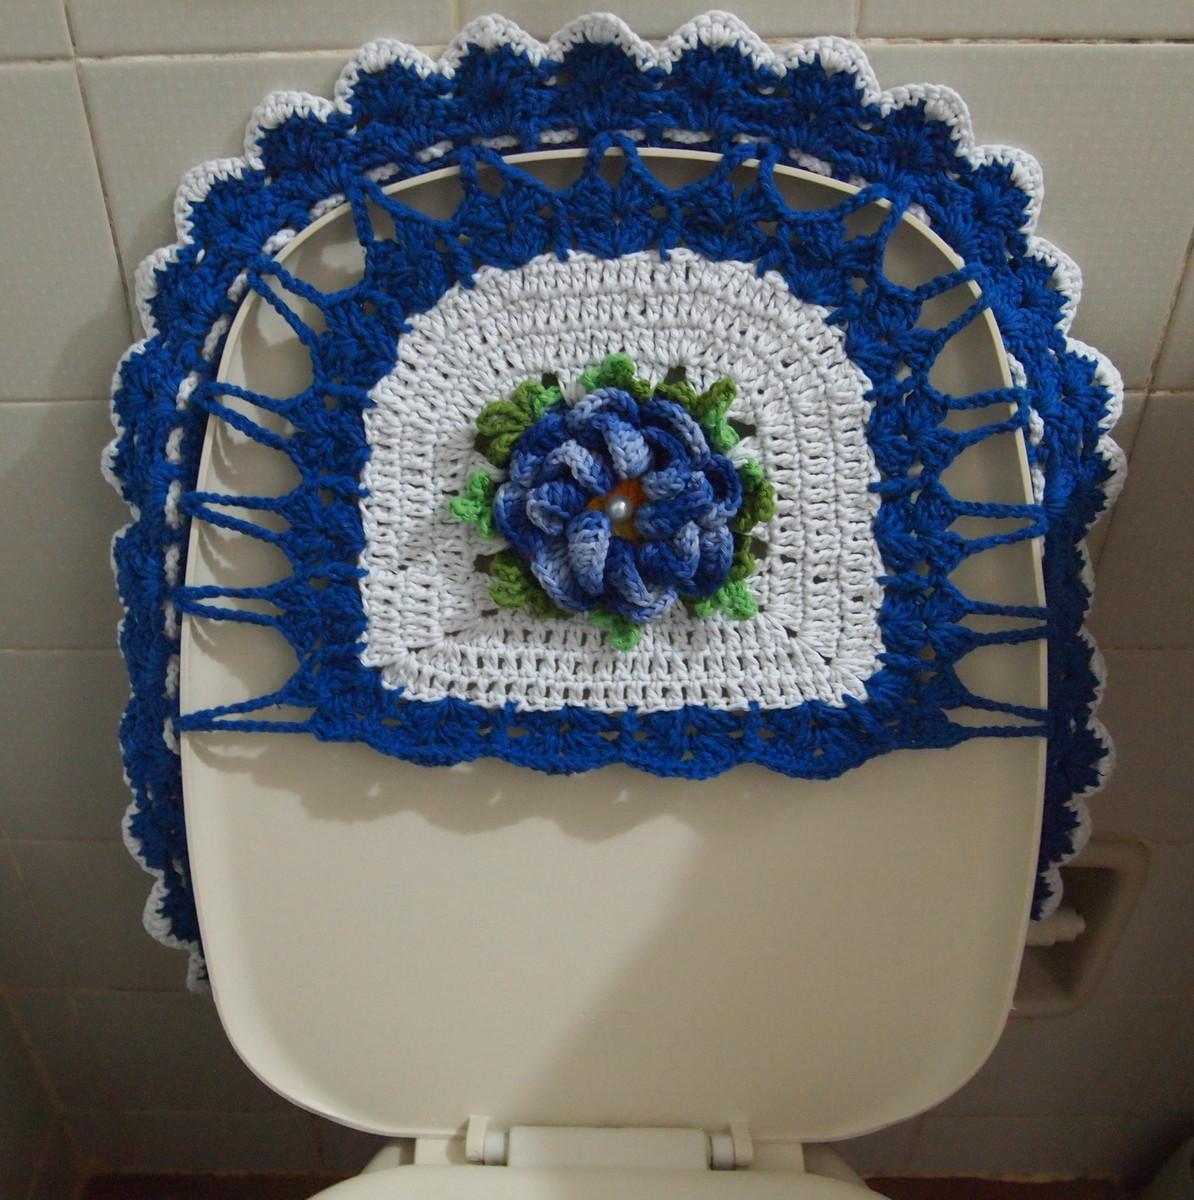 de banheiro azul e branco babado duplo jogo de banheiro azul e branco #10326B 1194x1200 Banheiro Azul Com Branco